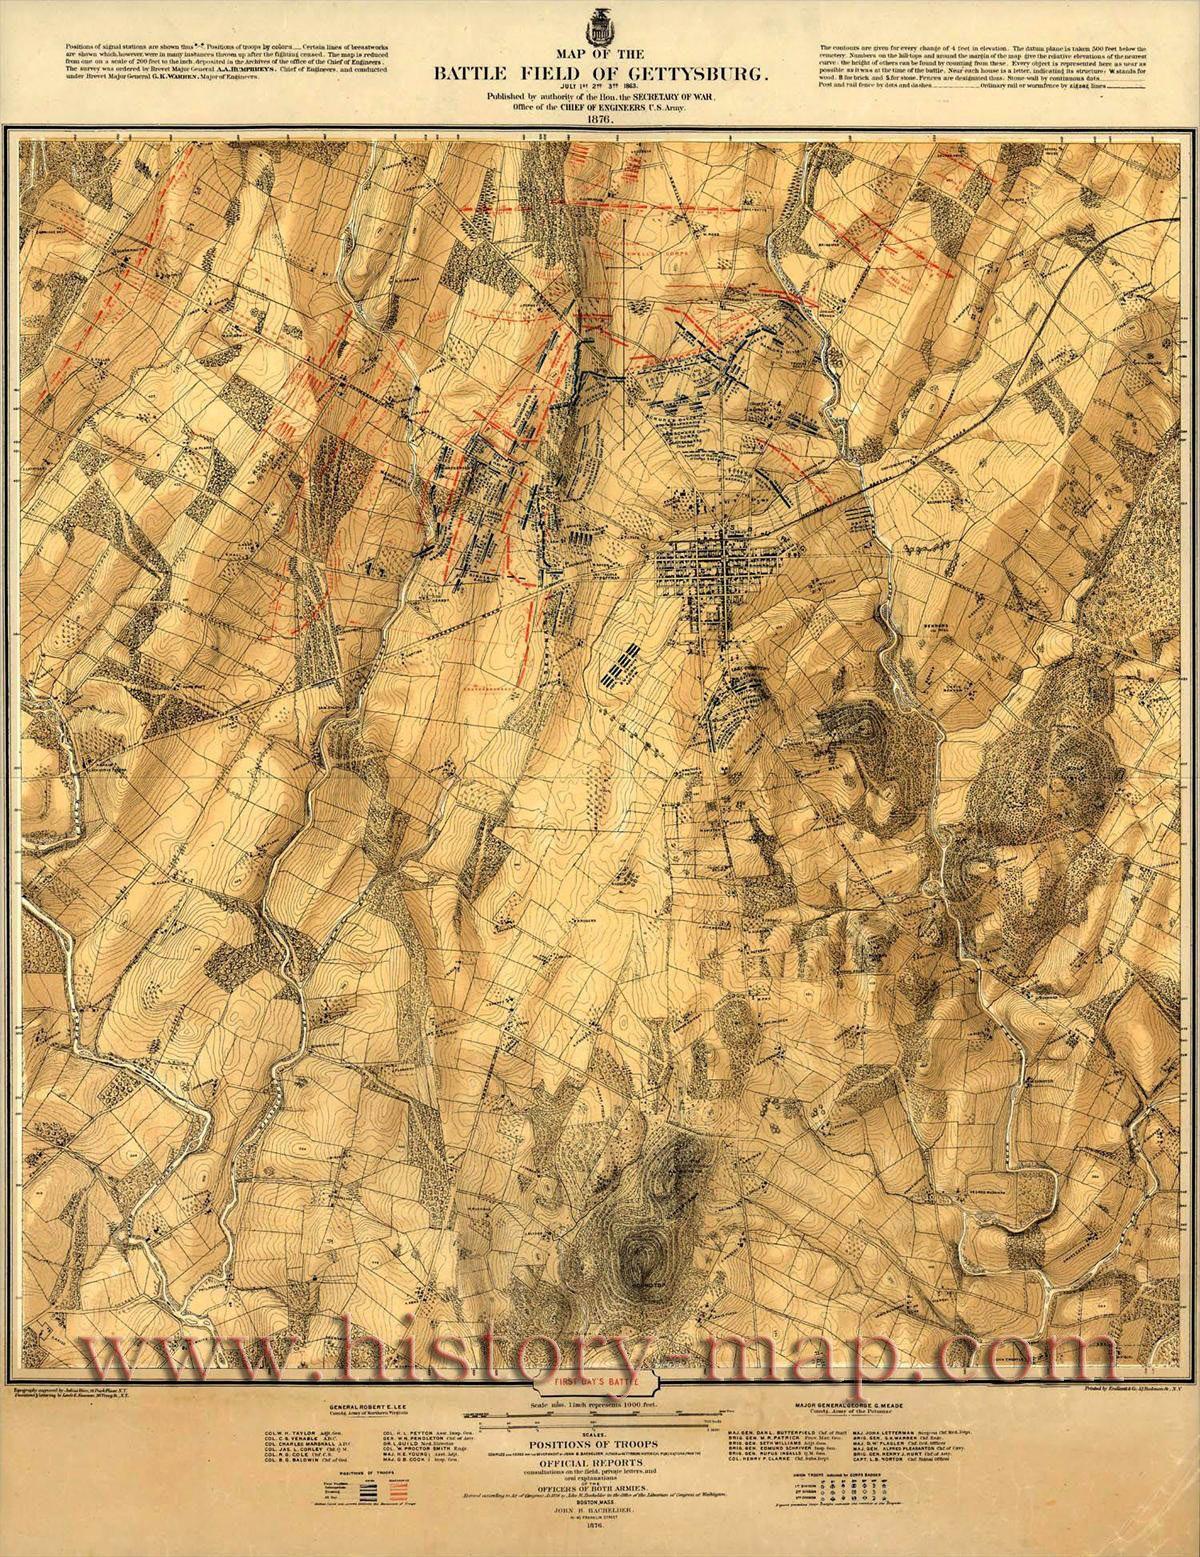 Battle of Gettysburg Map Gettysburg PA